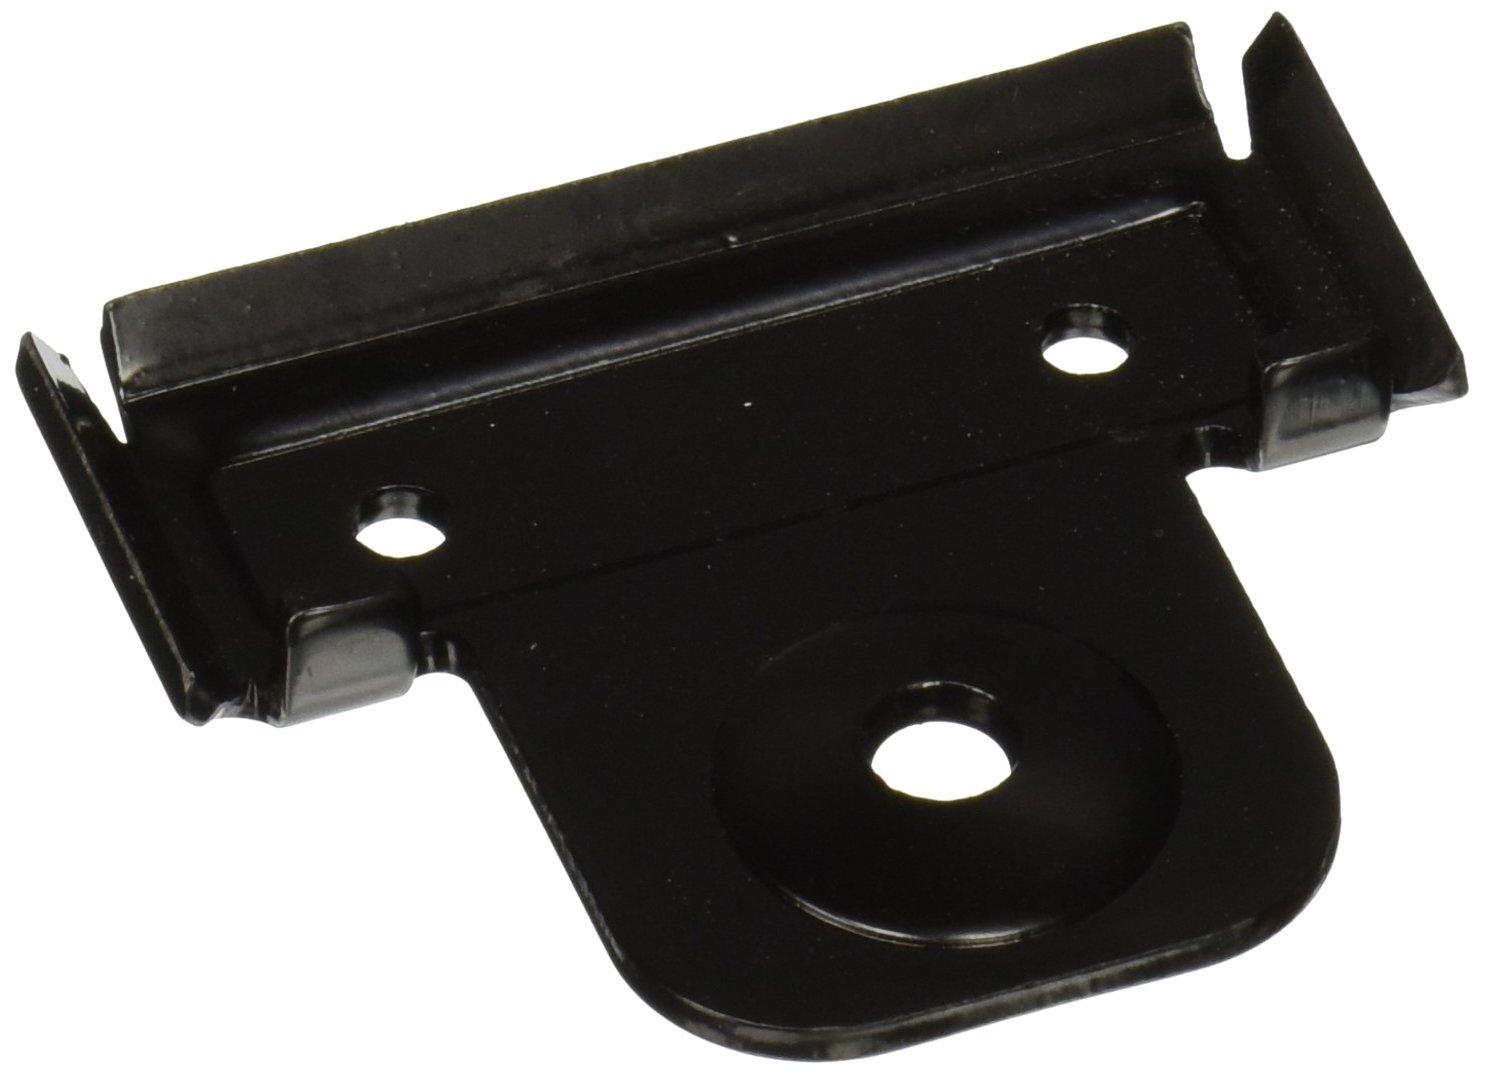 Stanley Hardware S690 330 CD743 Butt Marker in Black Coated